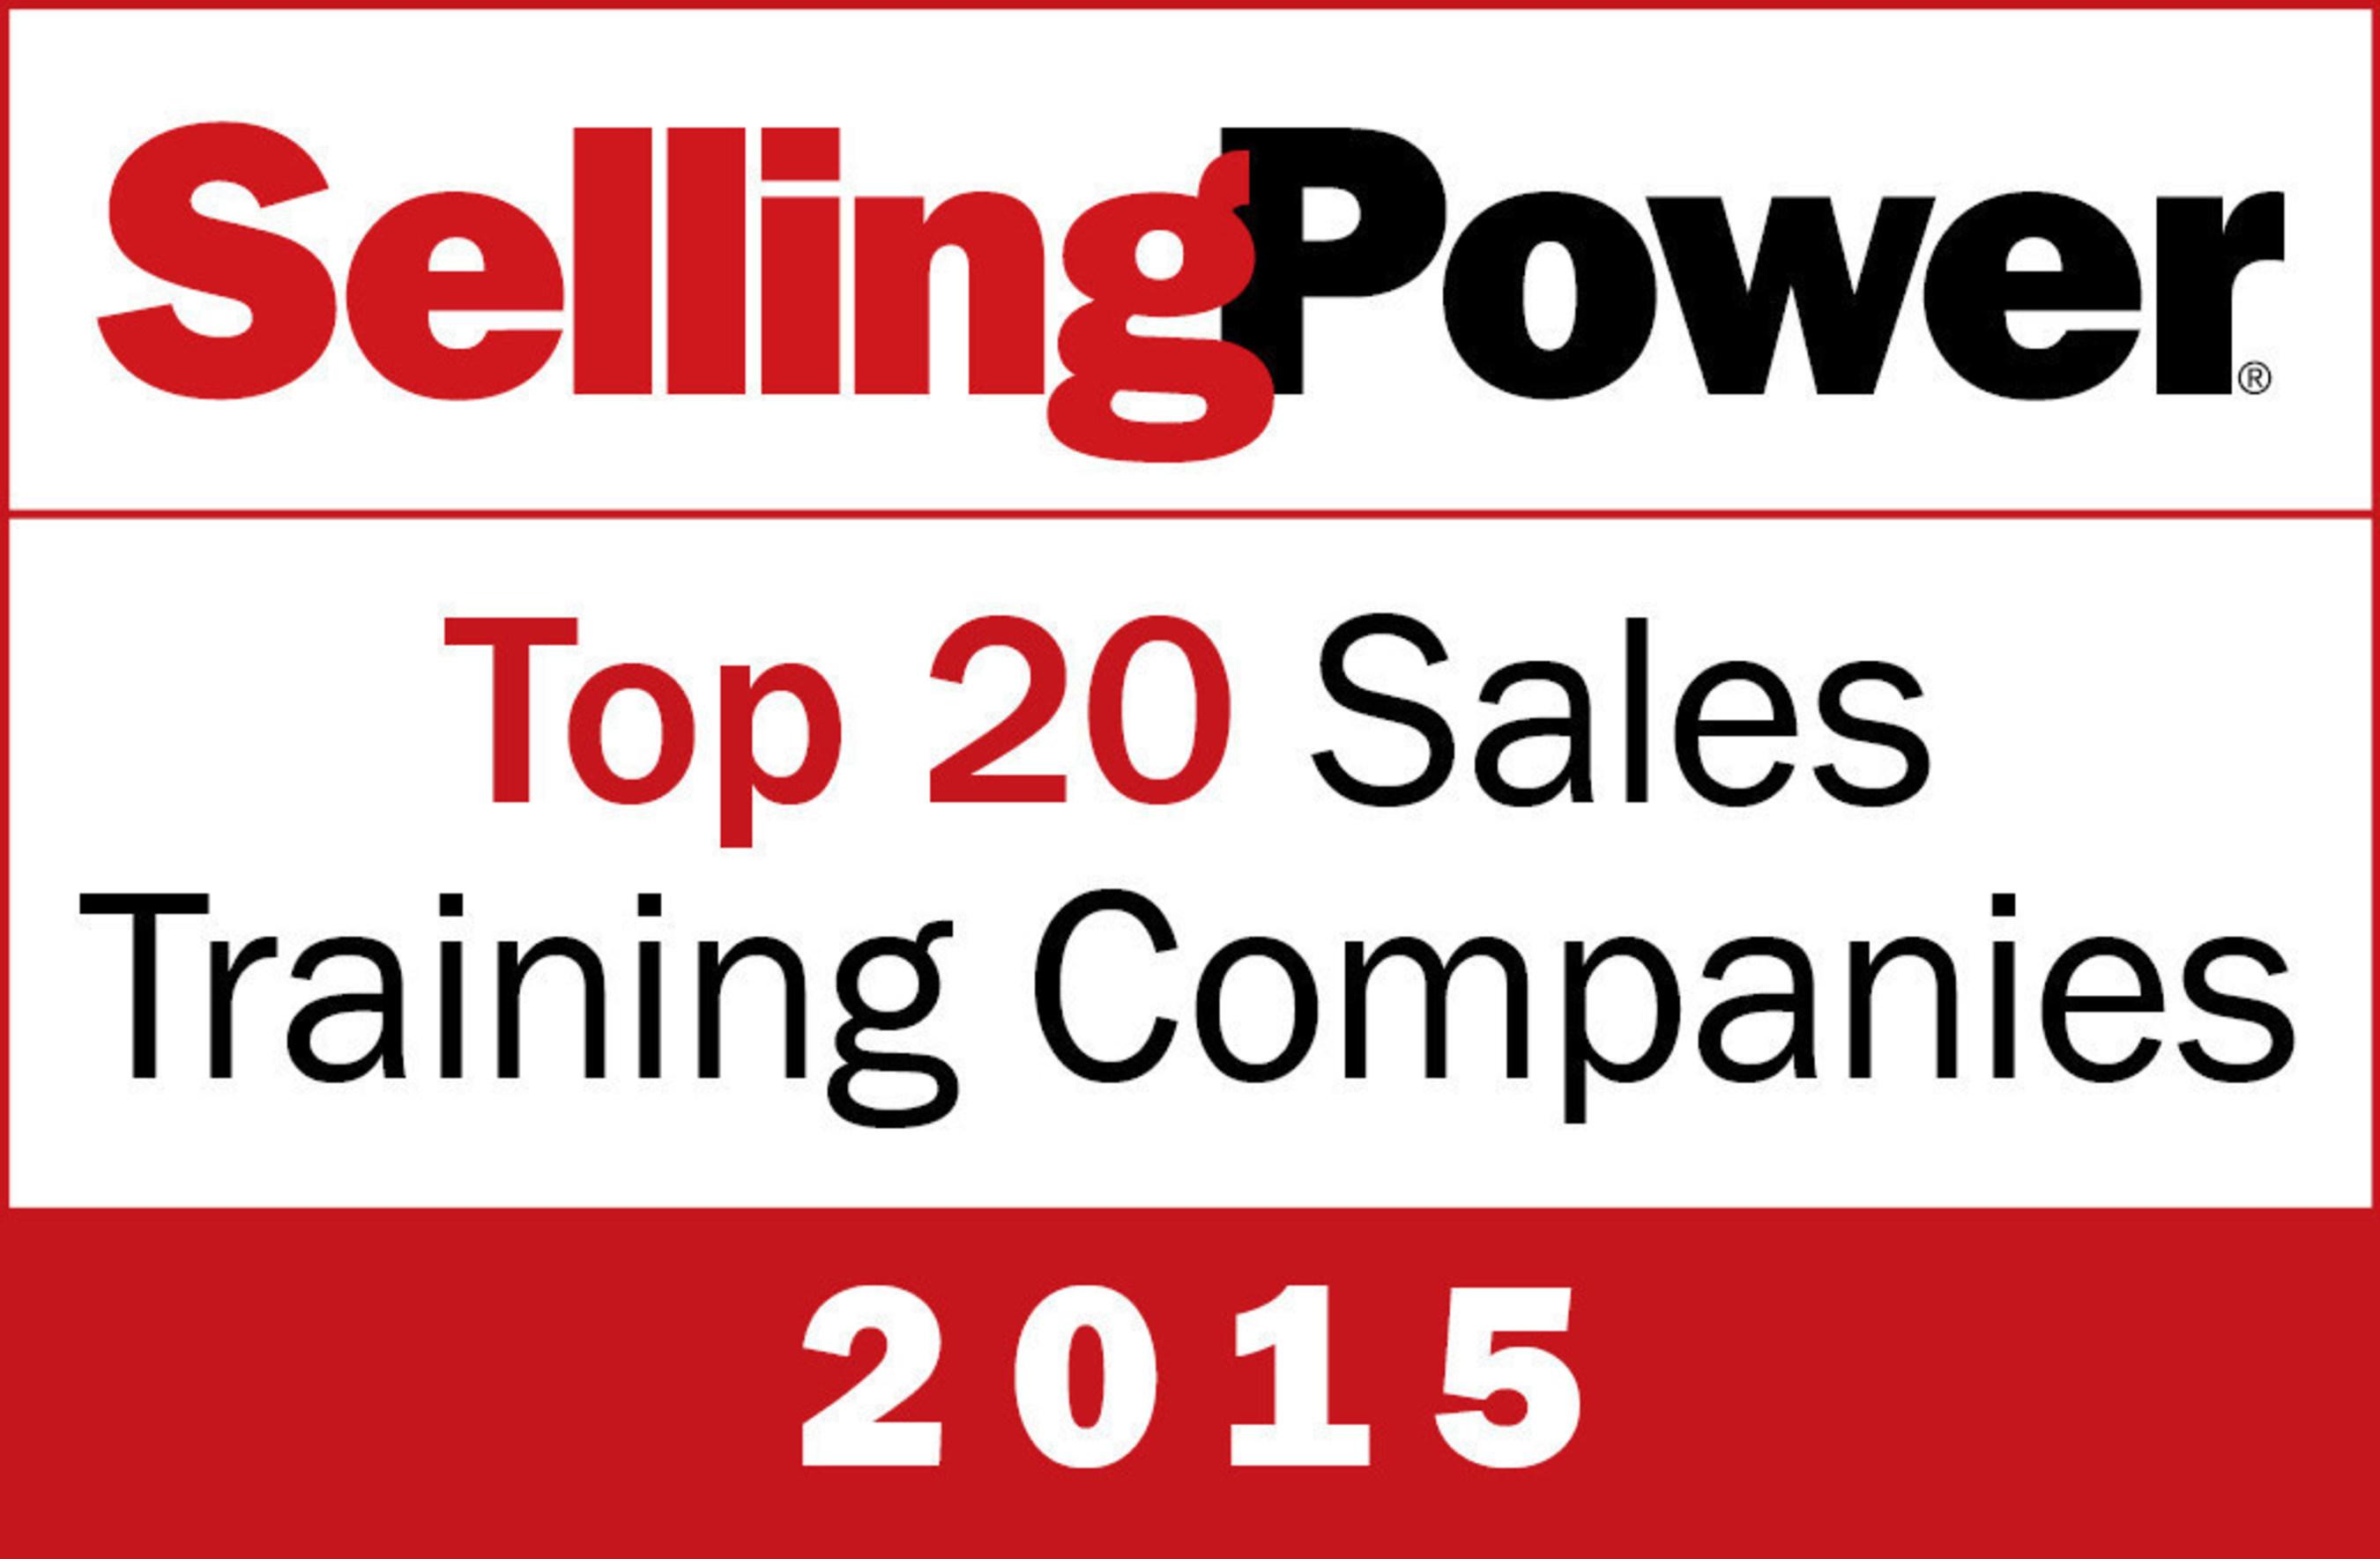 Selling Power Top 20 Sales Training Companies logo